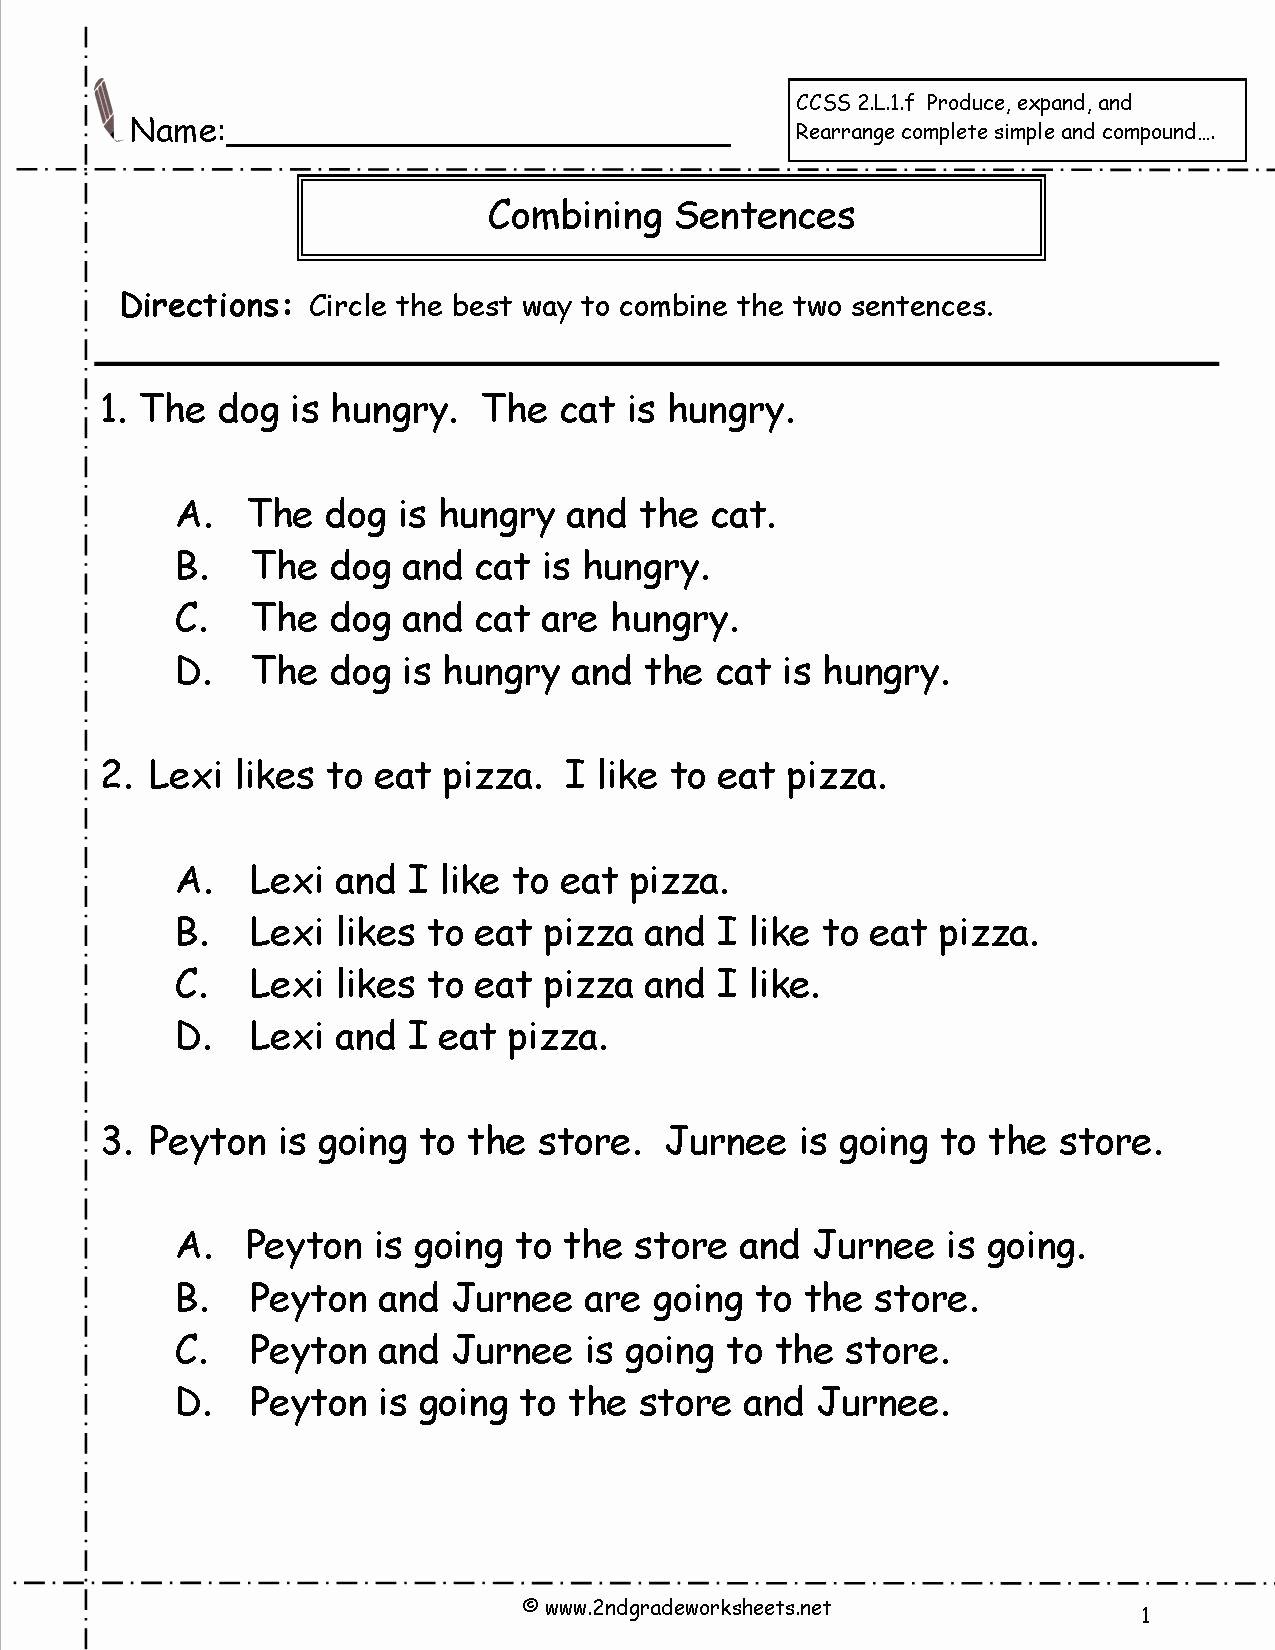 Third Grade Editing Worksheets Lovely 20 Ecosystem Worksheet Answer Key